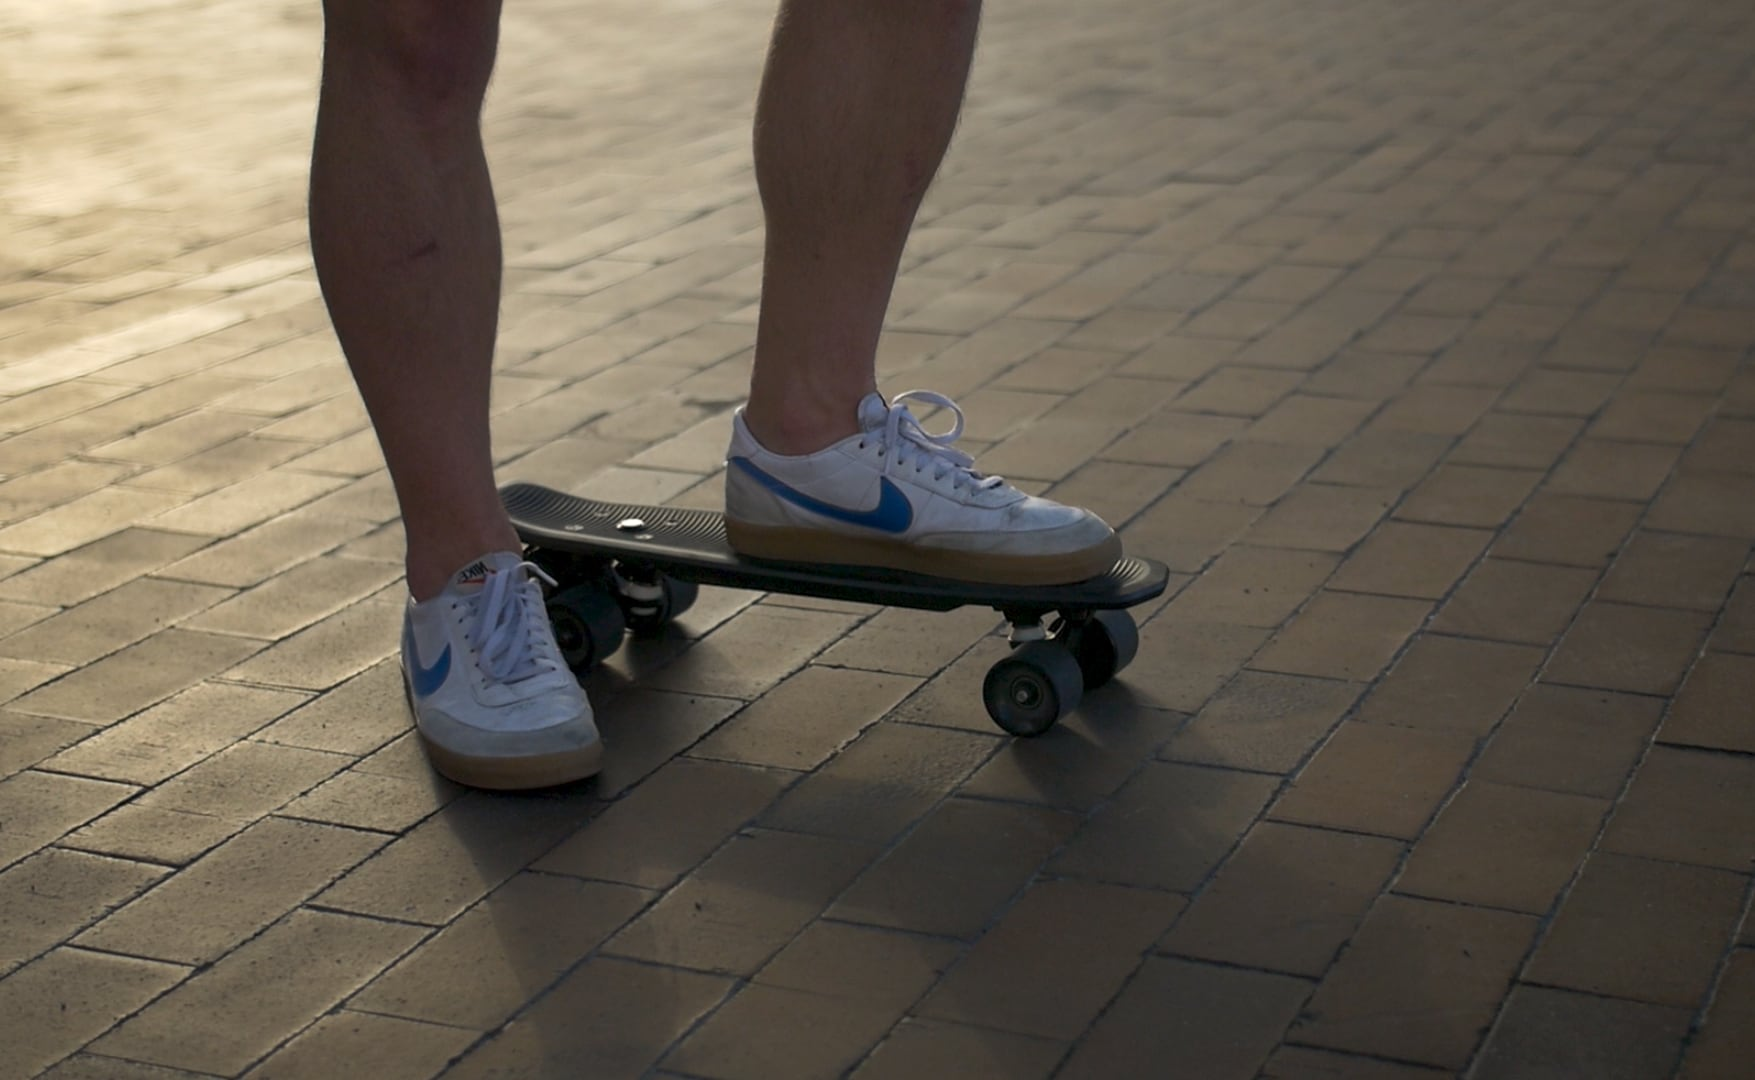 Headless Electric Cruiser Lightweight E-Skateboard requires no remote